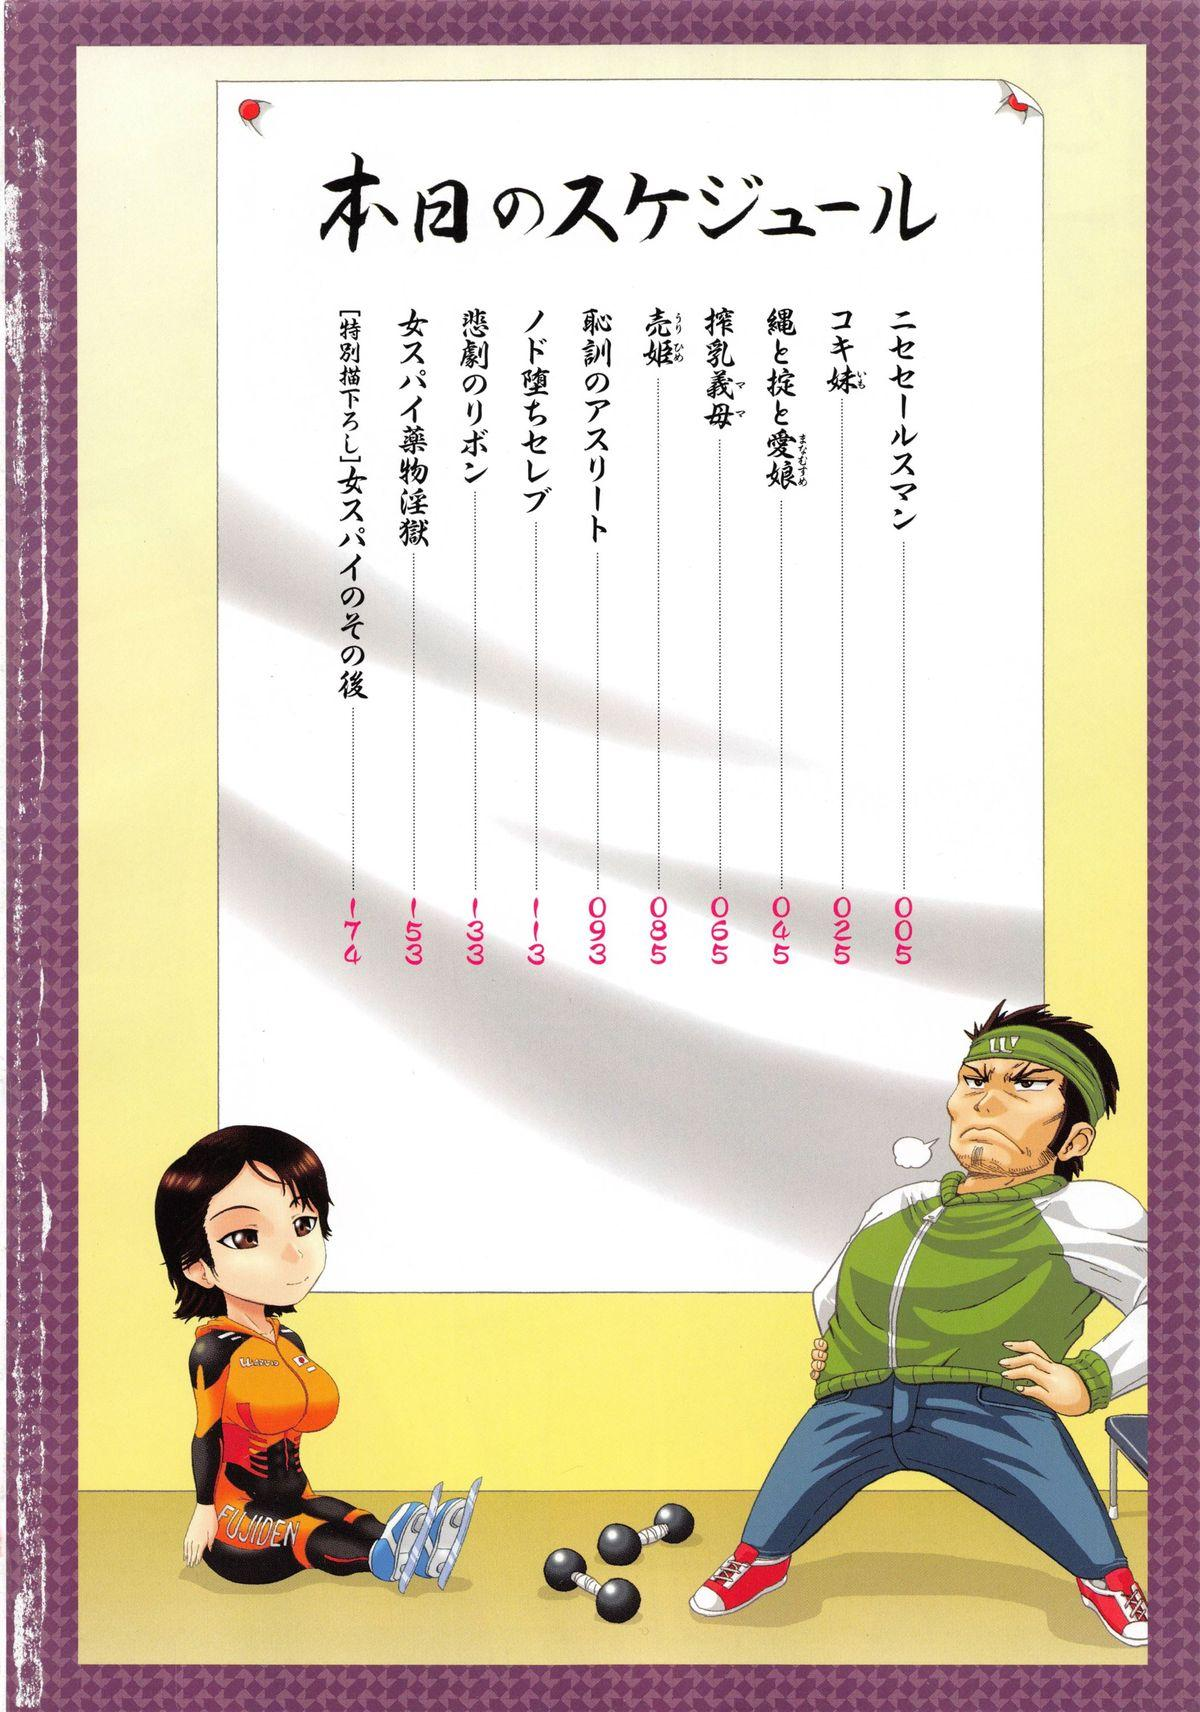 [Nukunuku Orange] Seikou ~Maeana Kanzen Houchi~ - Keep Anus in Anguish!!!! 7